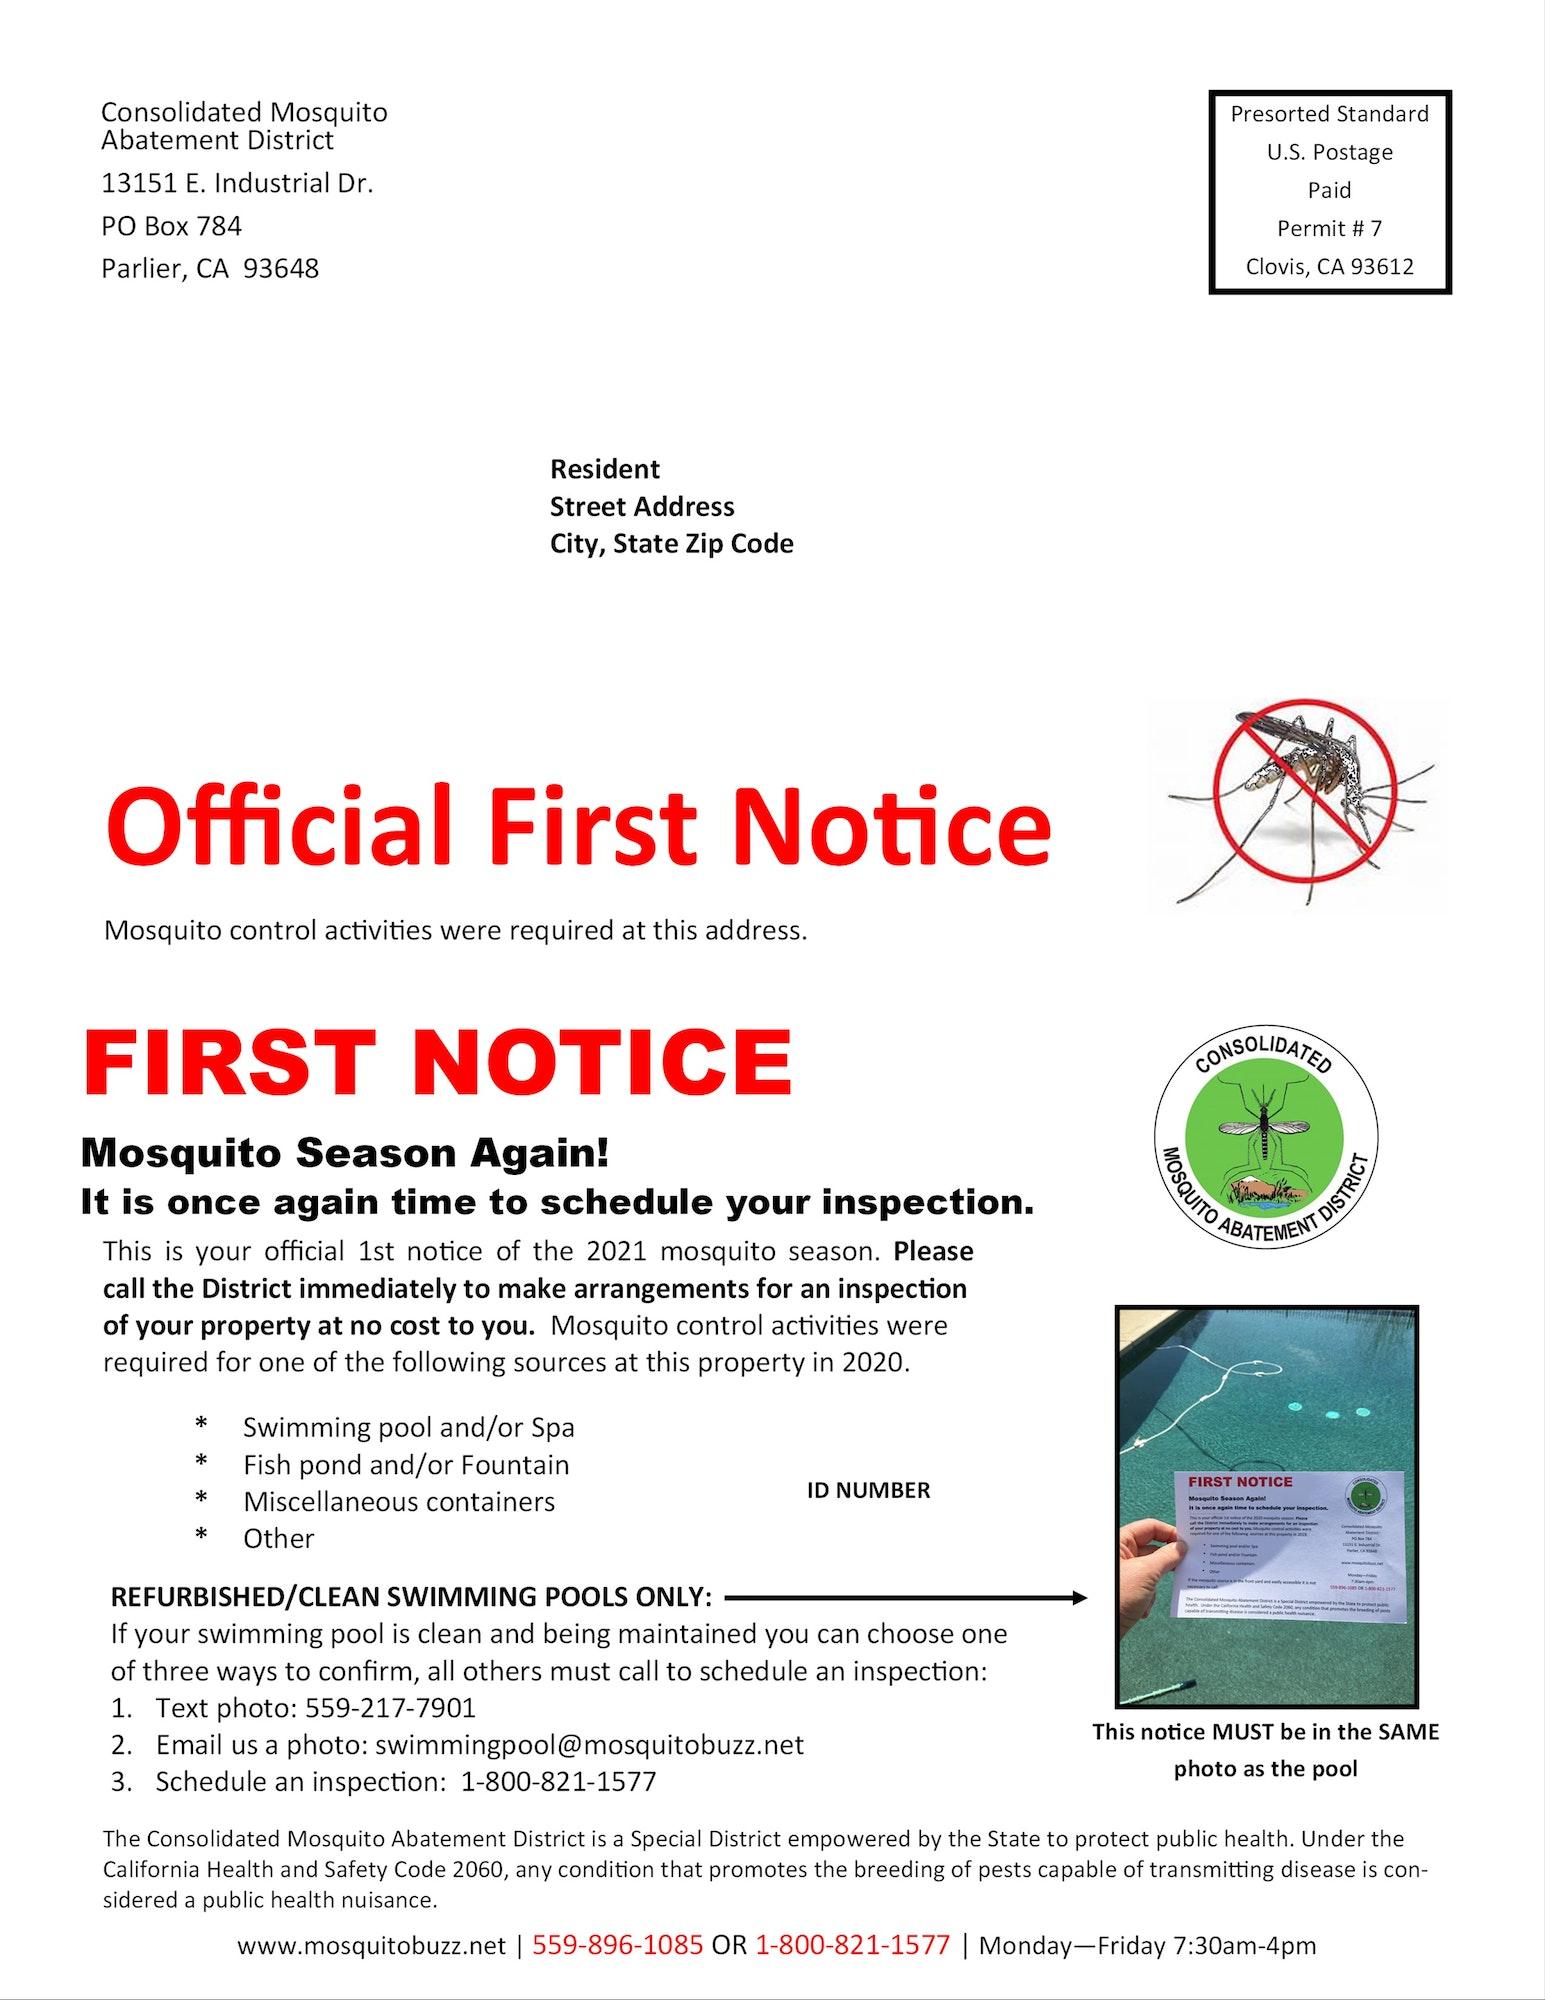 First notice mailer